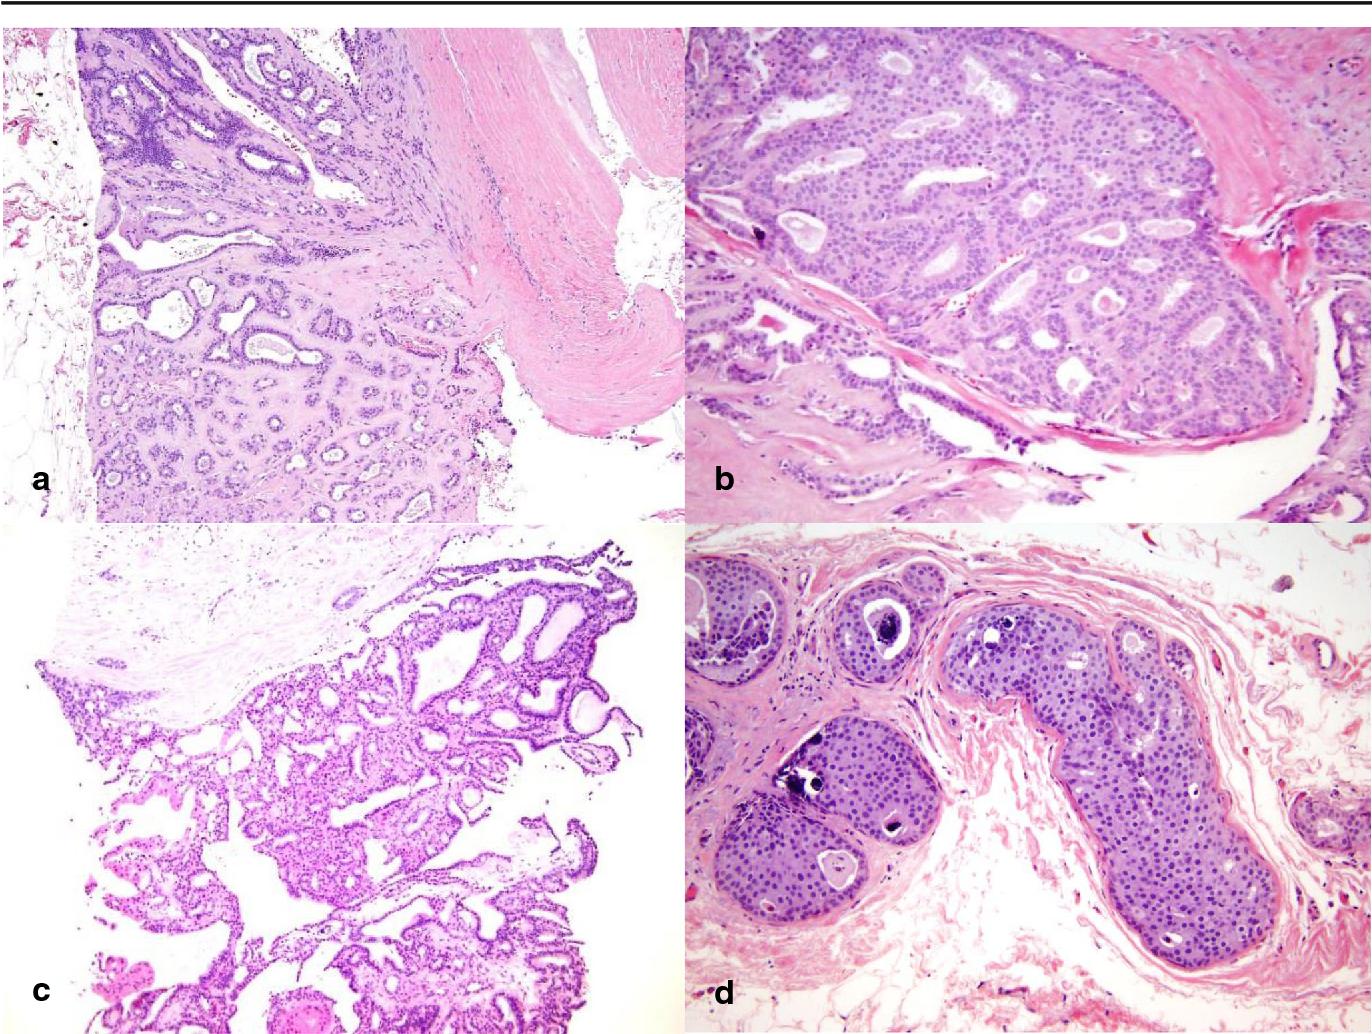 intraductal papilloma core biopsy